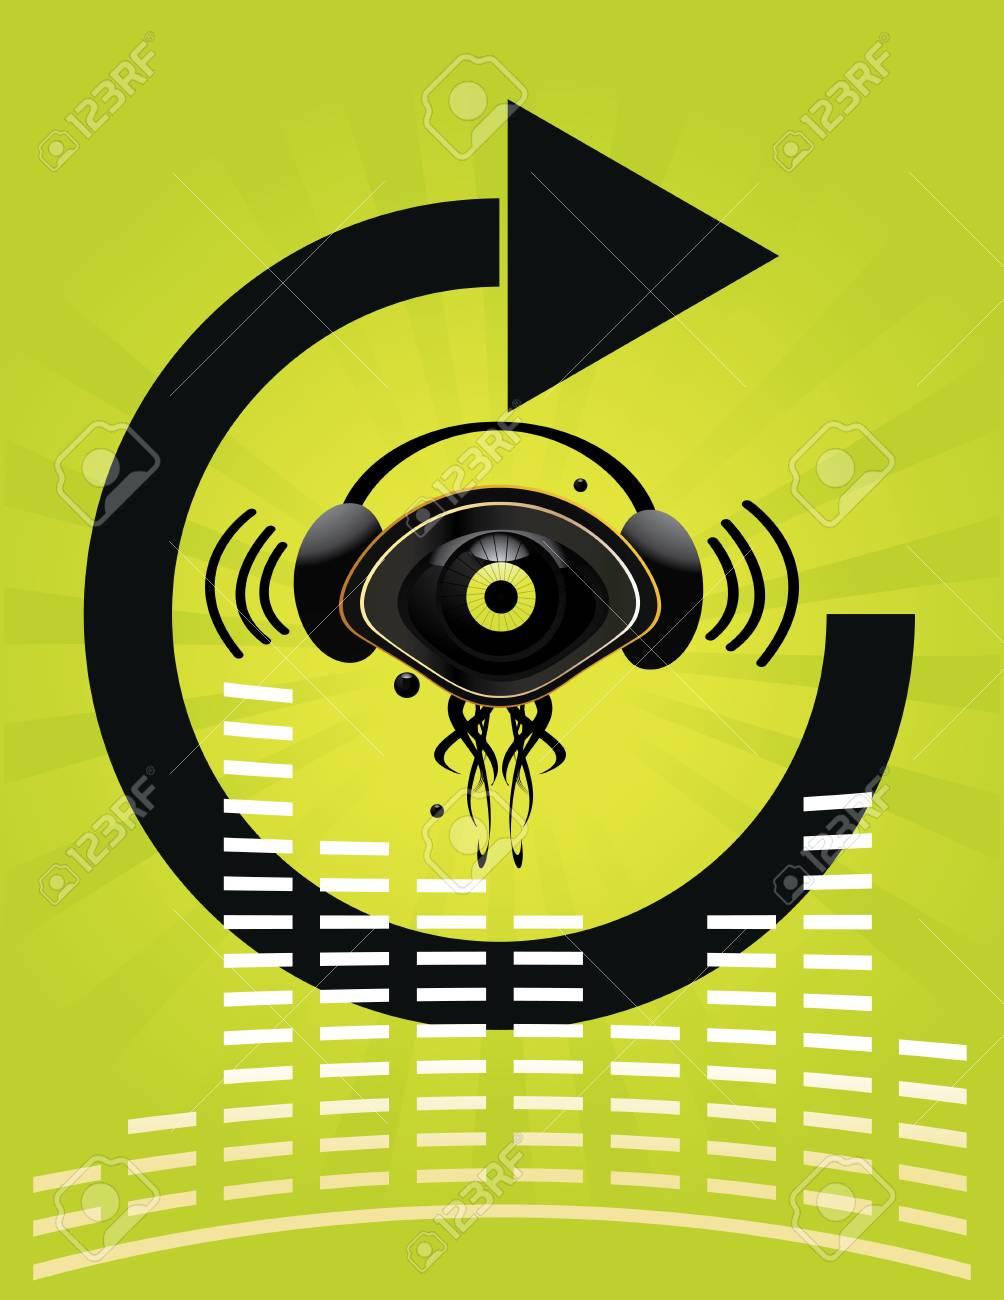 Eye character with headphones on green background Stock Photo - 4226015